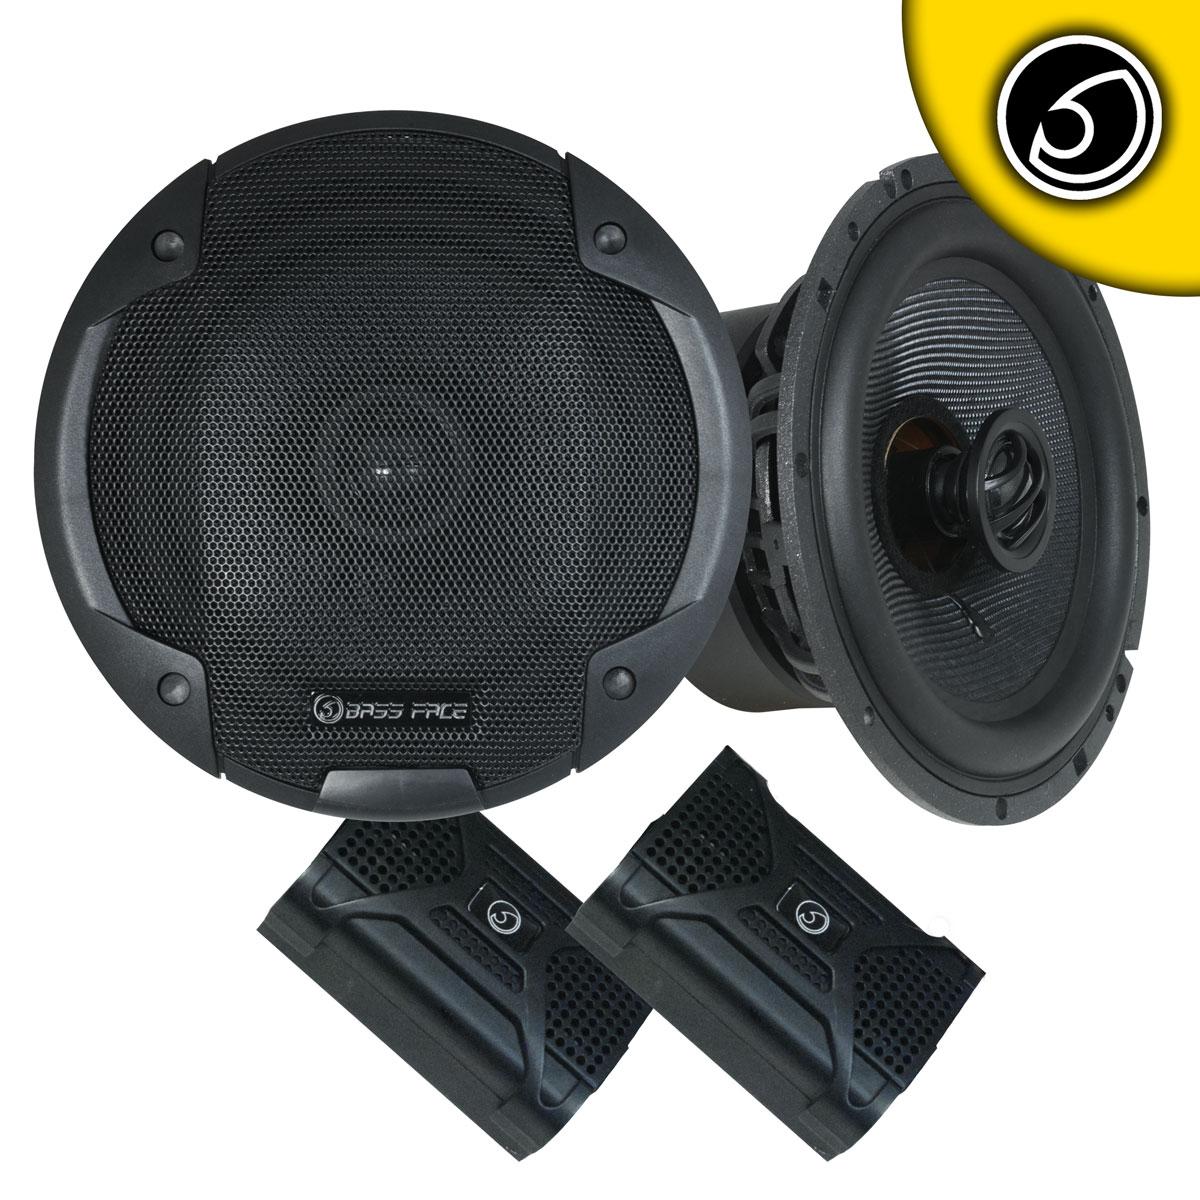 "Bassface BLACKSPL6.1 740w 6.5"" Inch 17cm 4Ohm Coaxial 2 Way Speaker Pair"